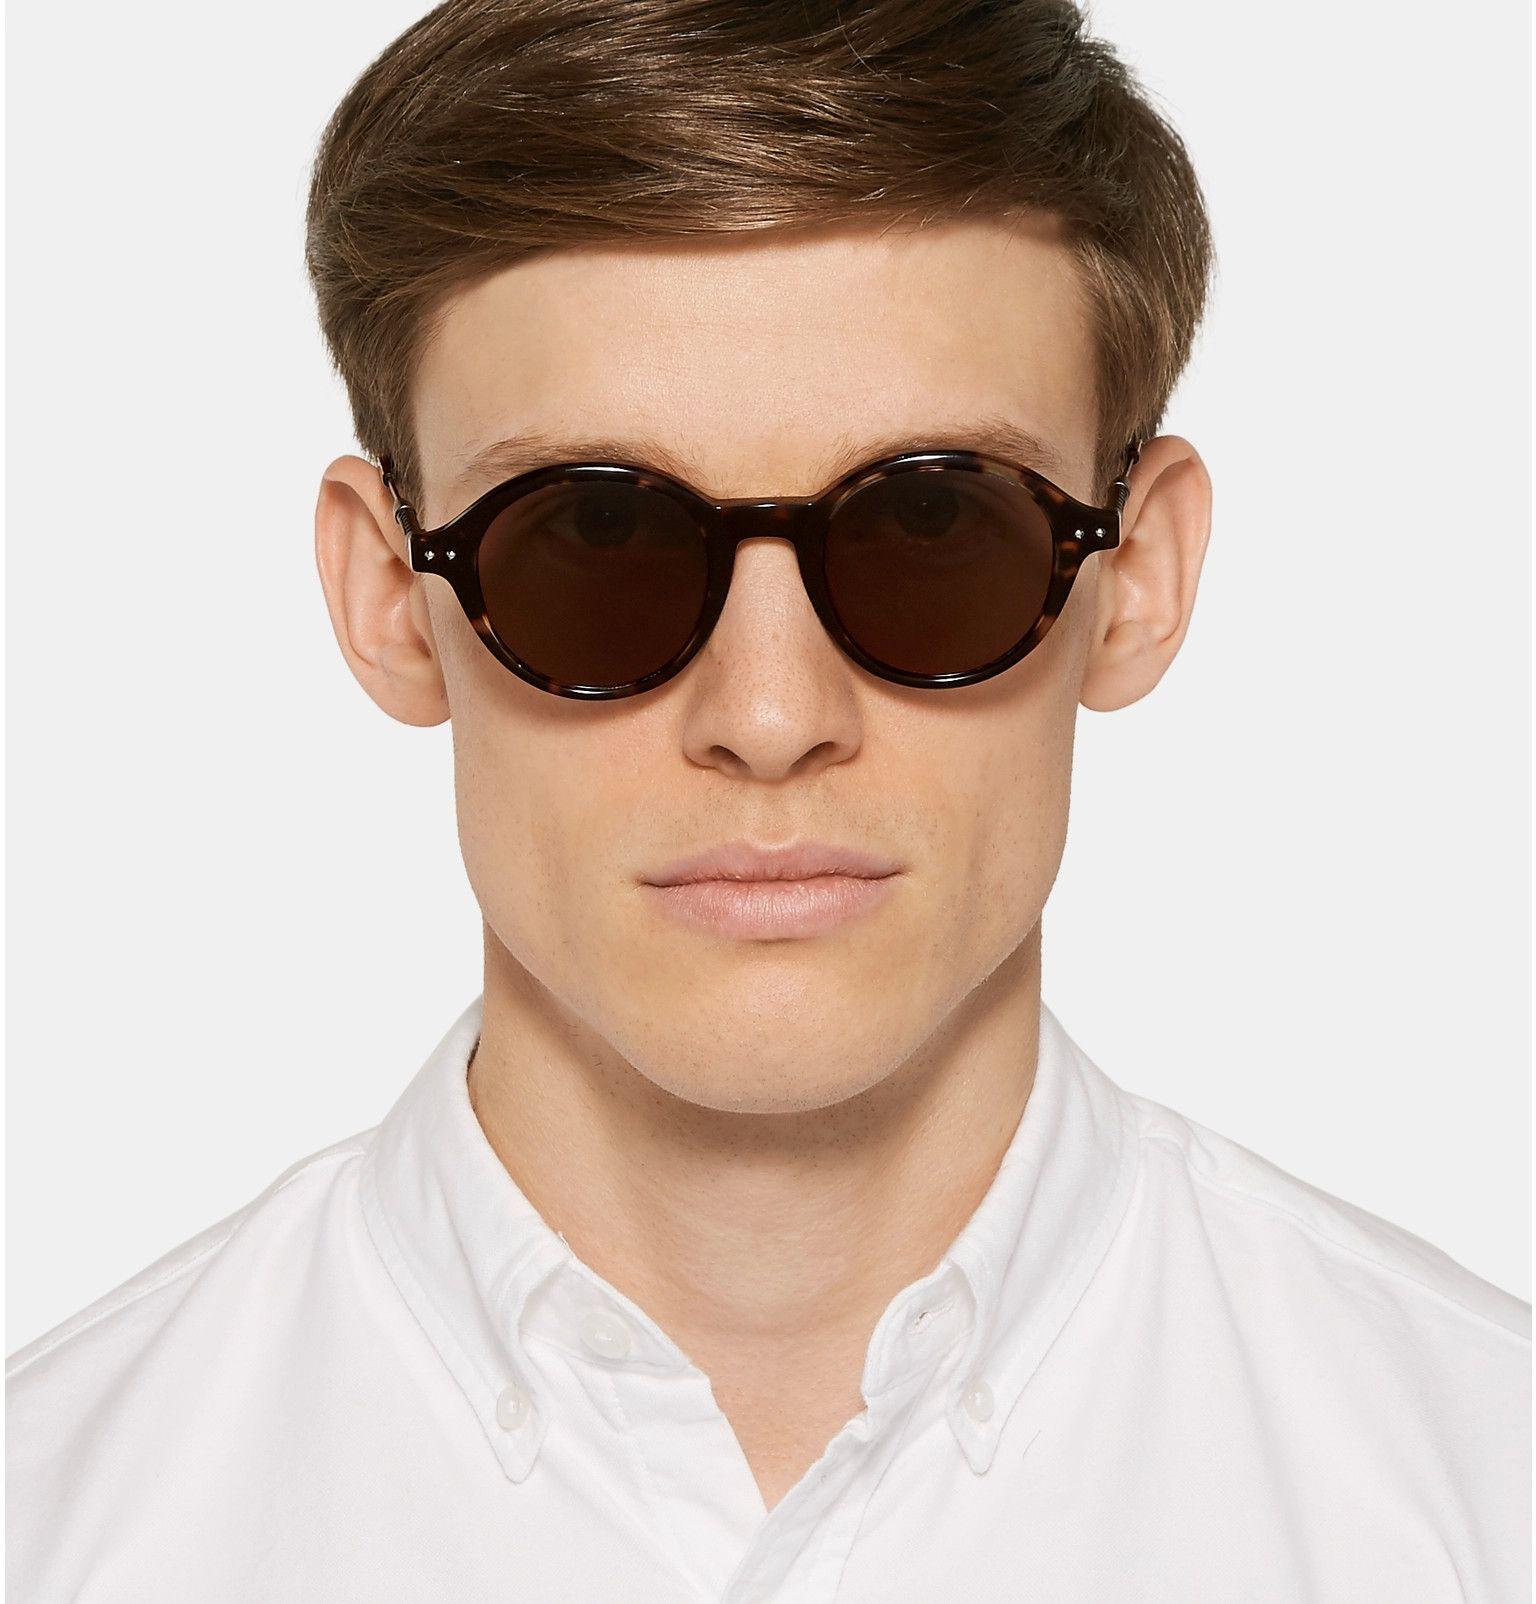 89ed50f04 BOTTEGA VENETA Round-Frame Leather-Trimmed Tortoiseshell Acetate Sunglasses